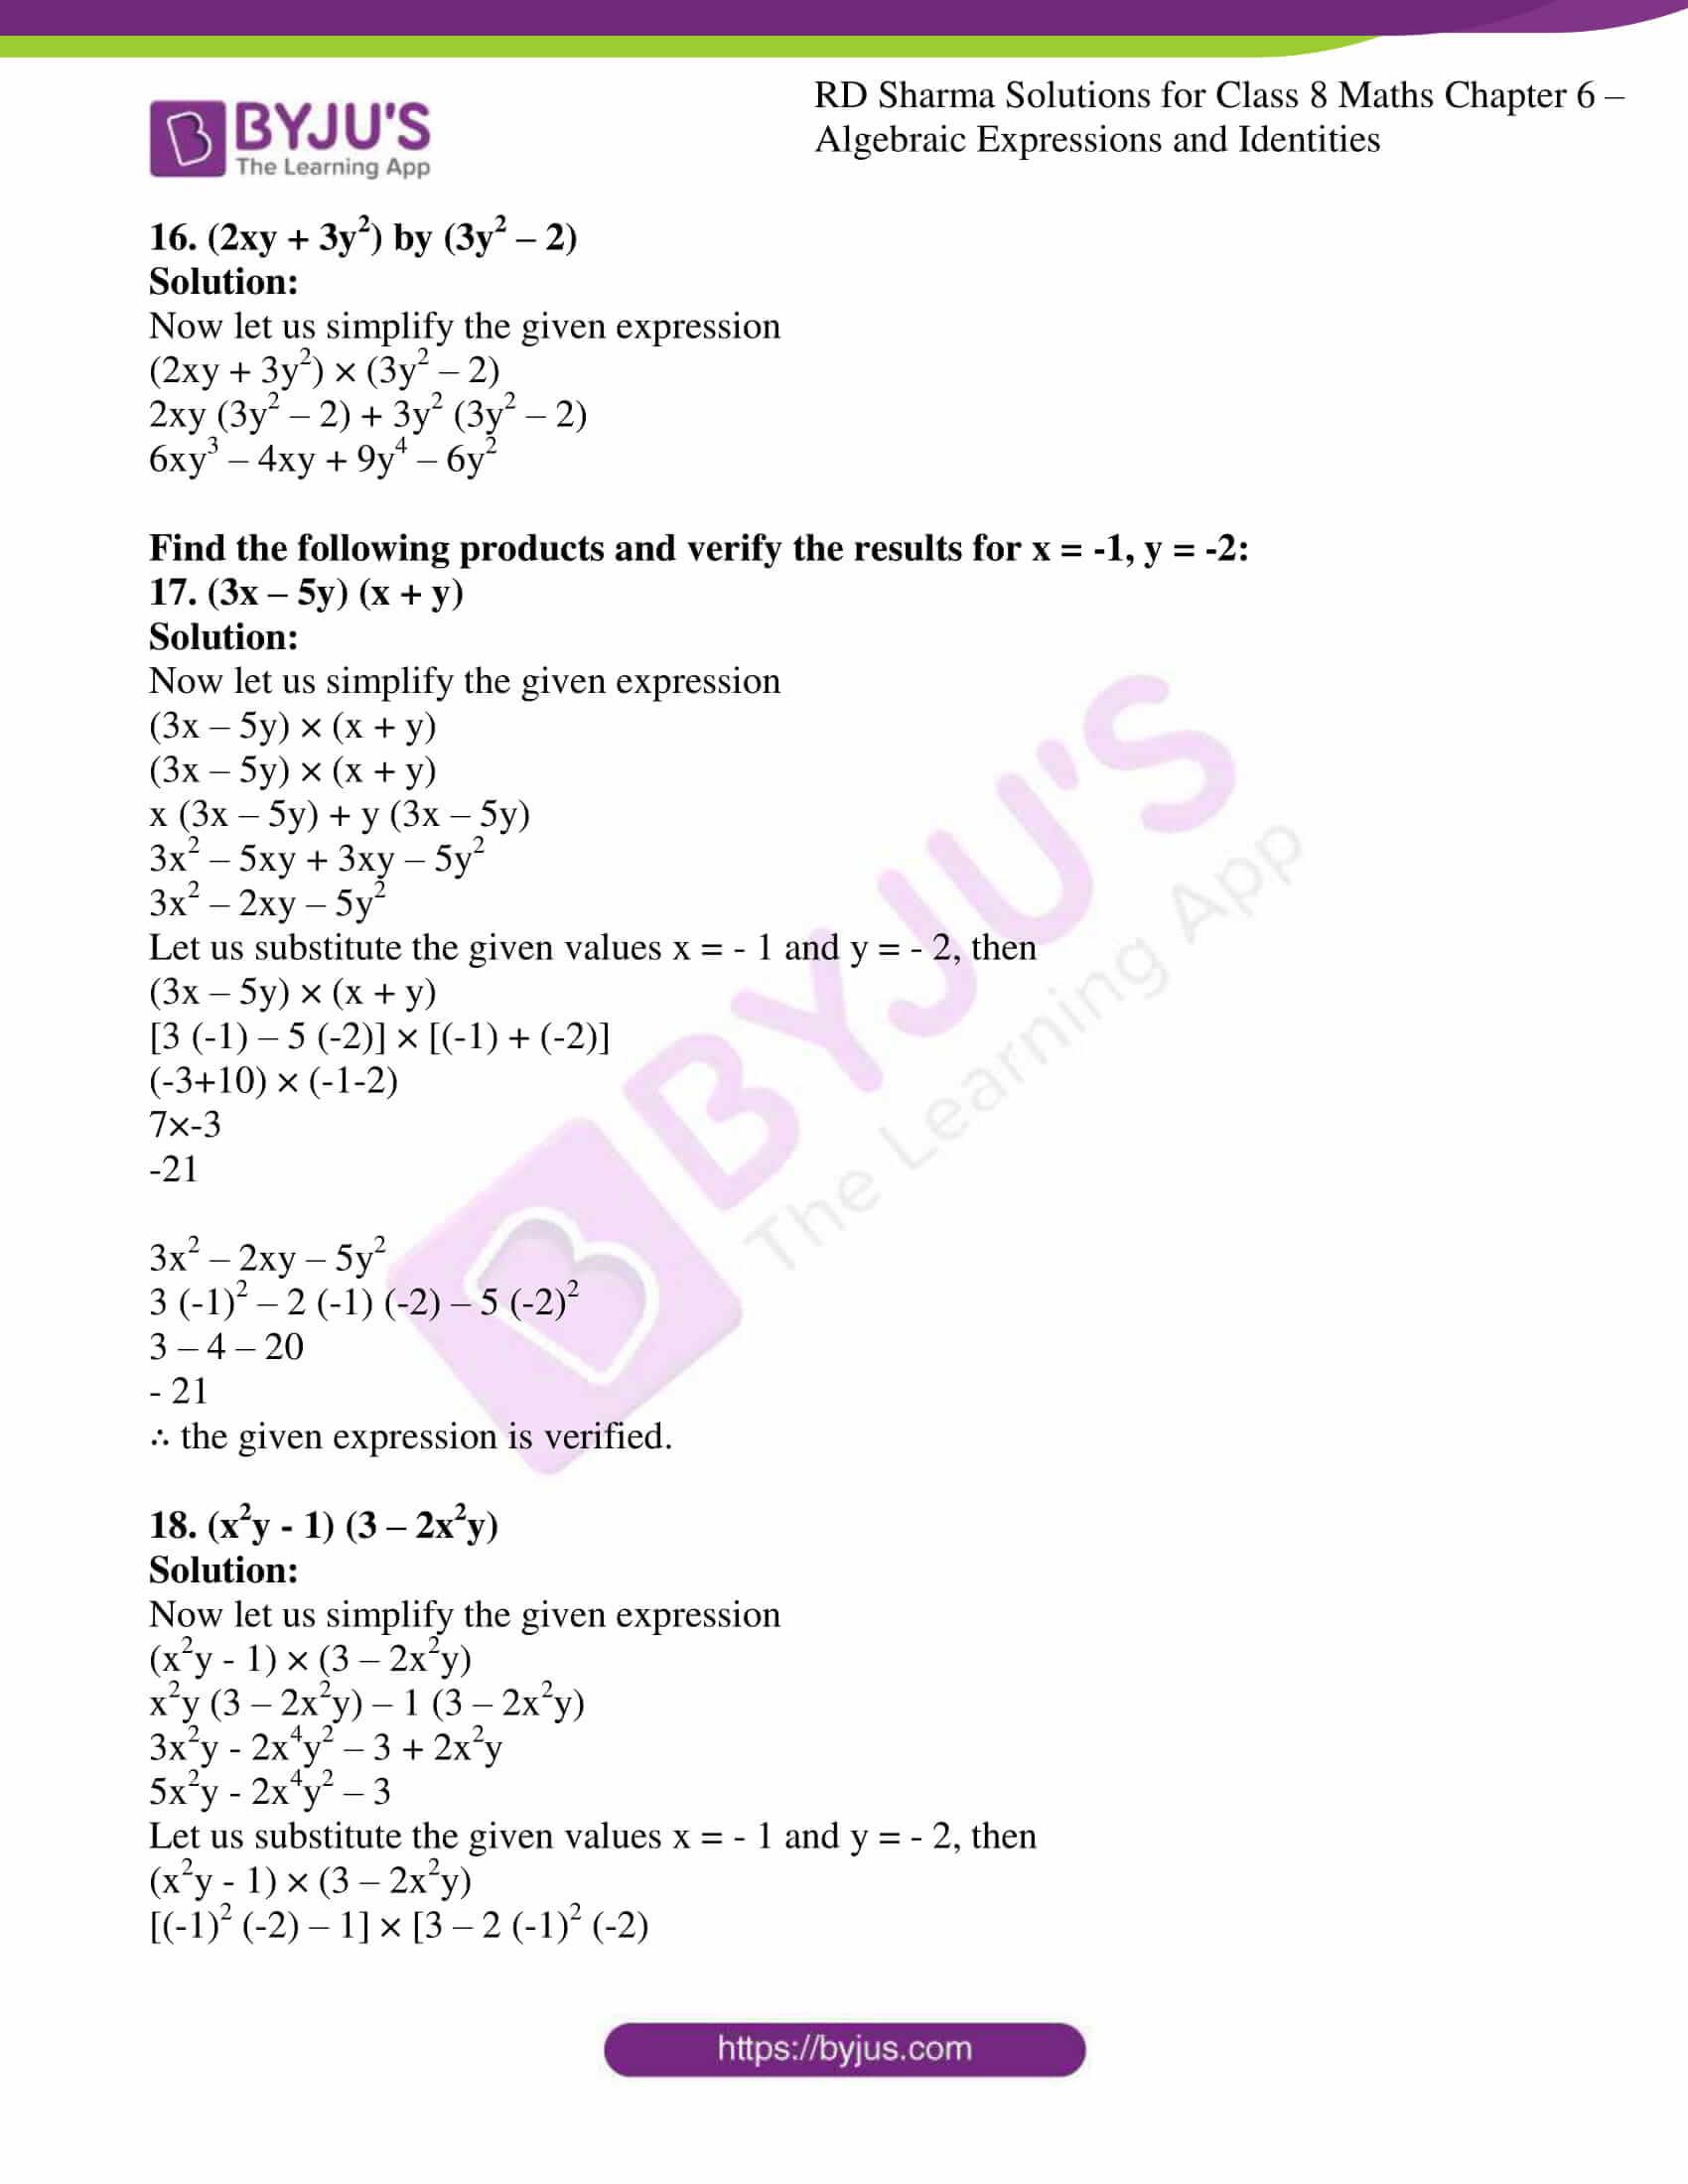 rd sharma class 8 maths chapter 6 exercise 5 4